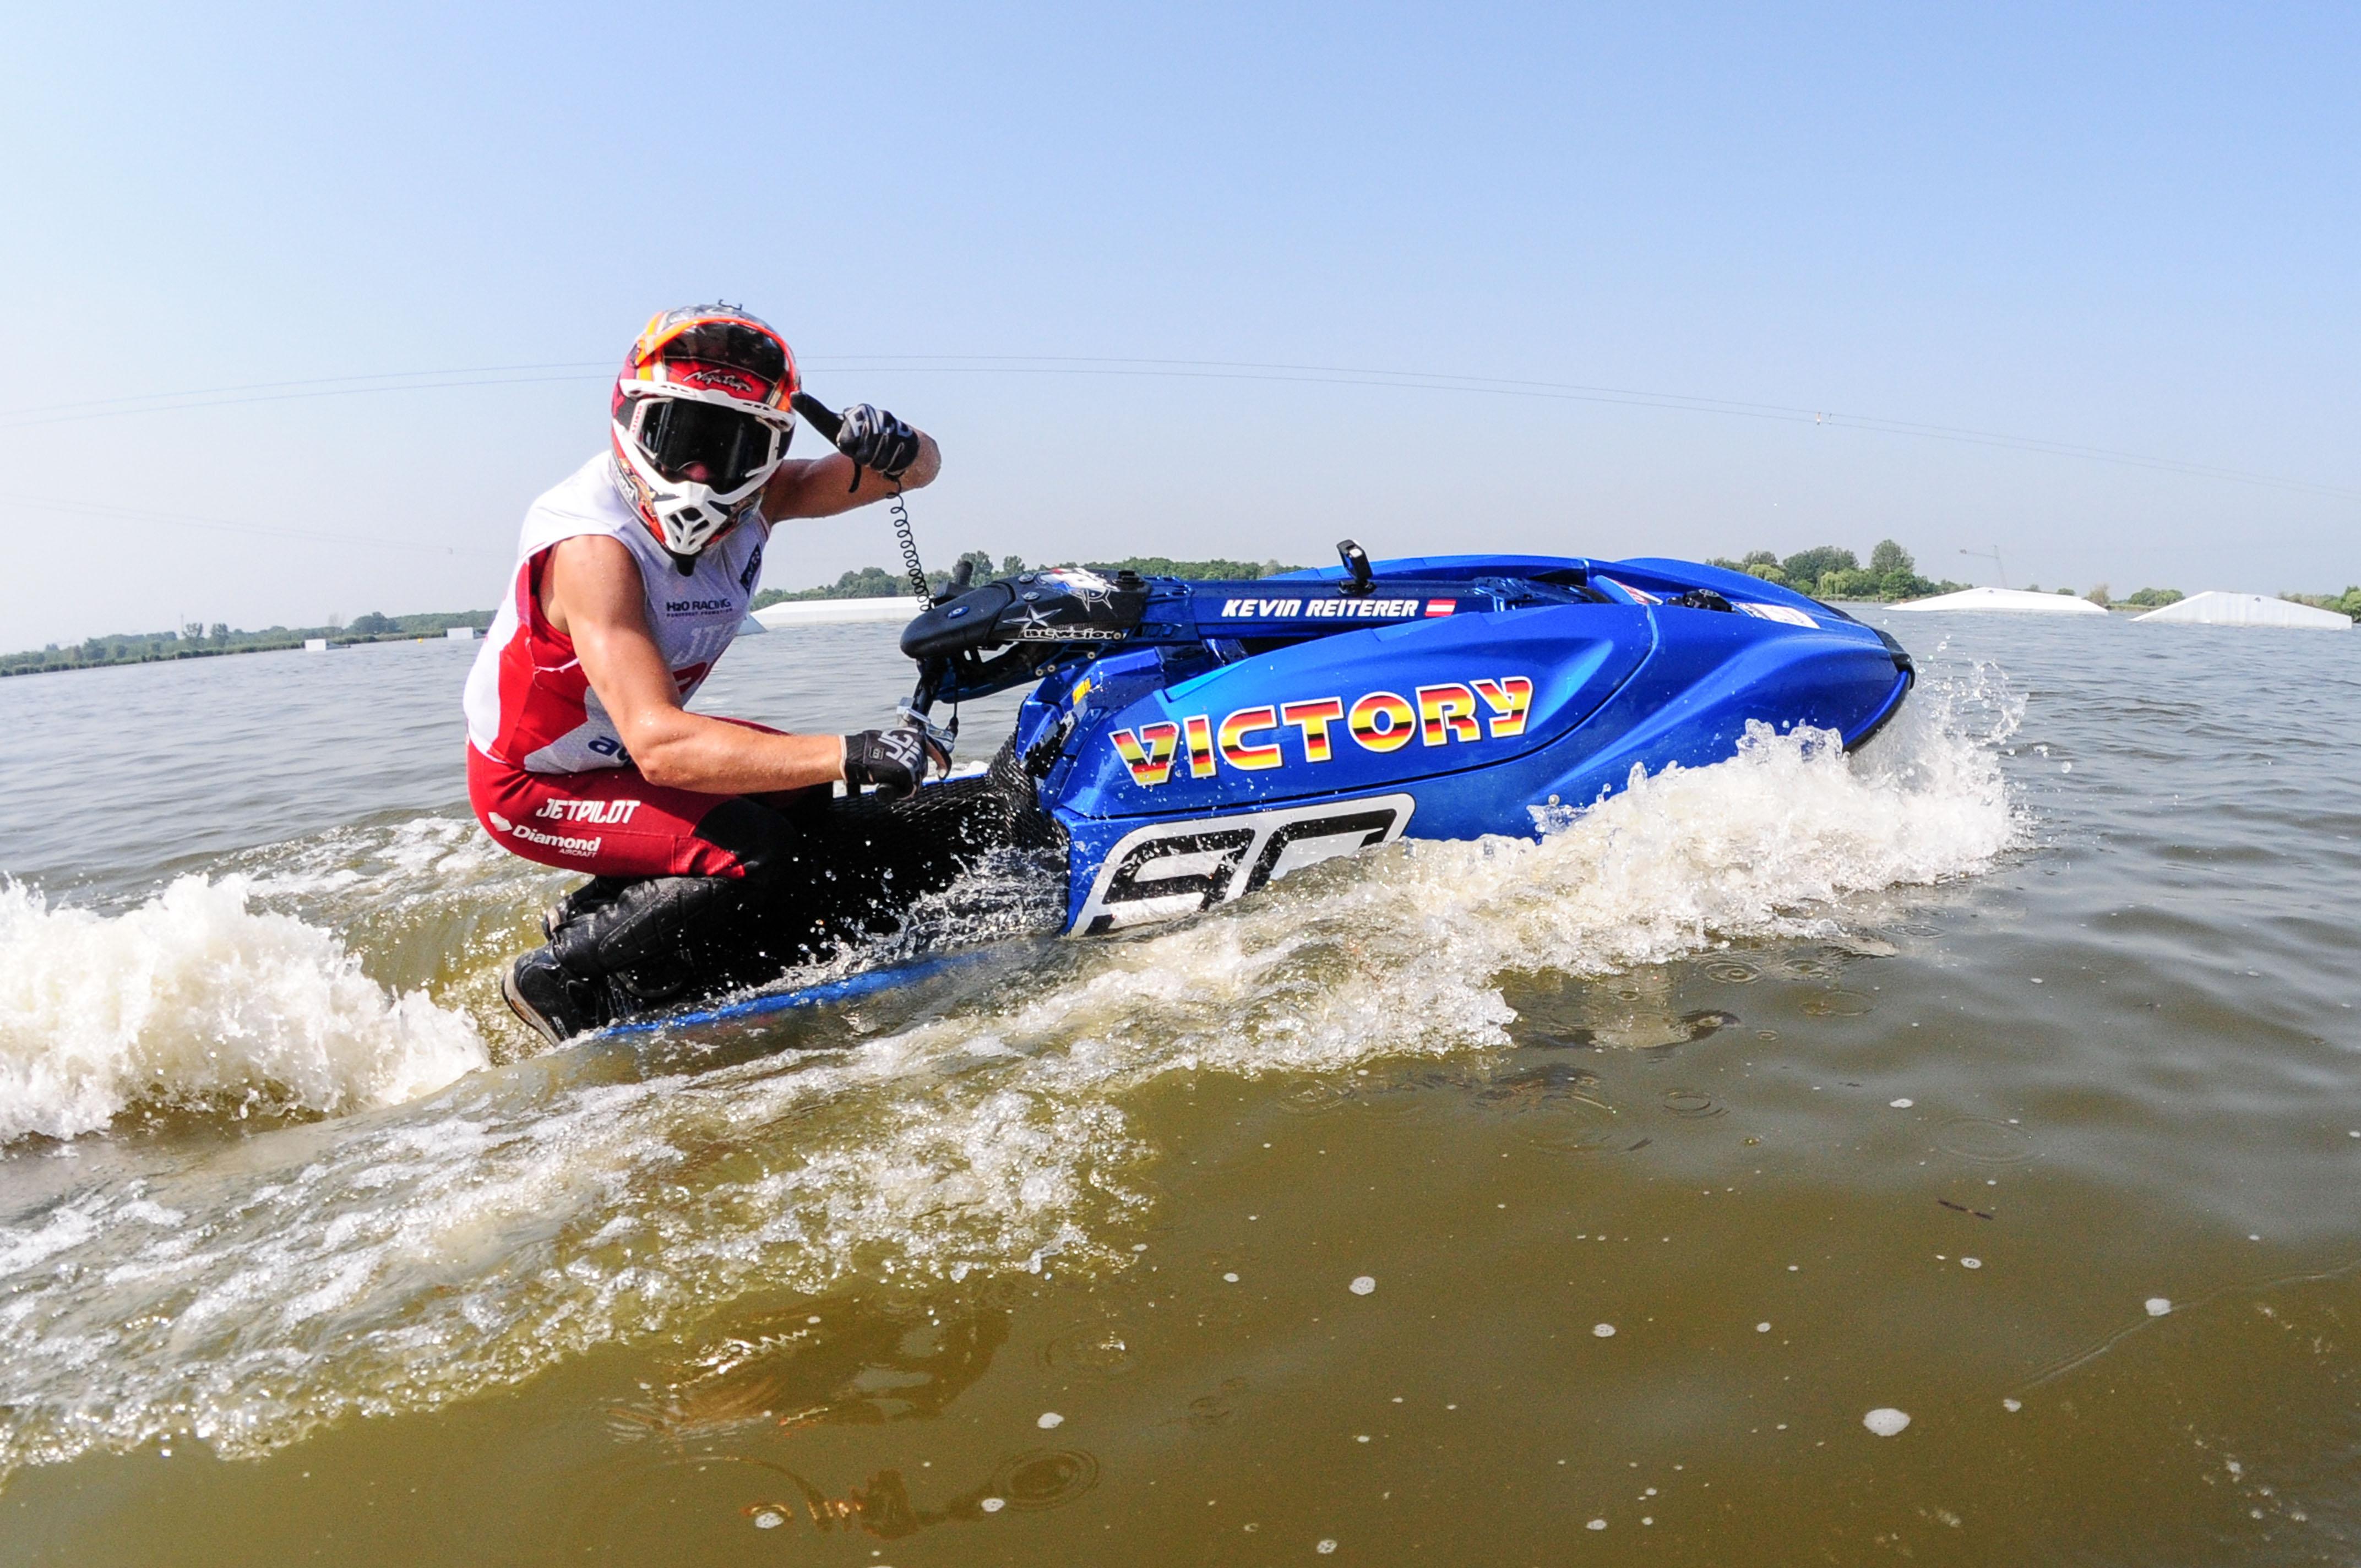 Victory Team Participates in Aquabike World Championship